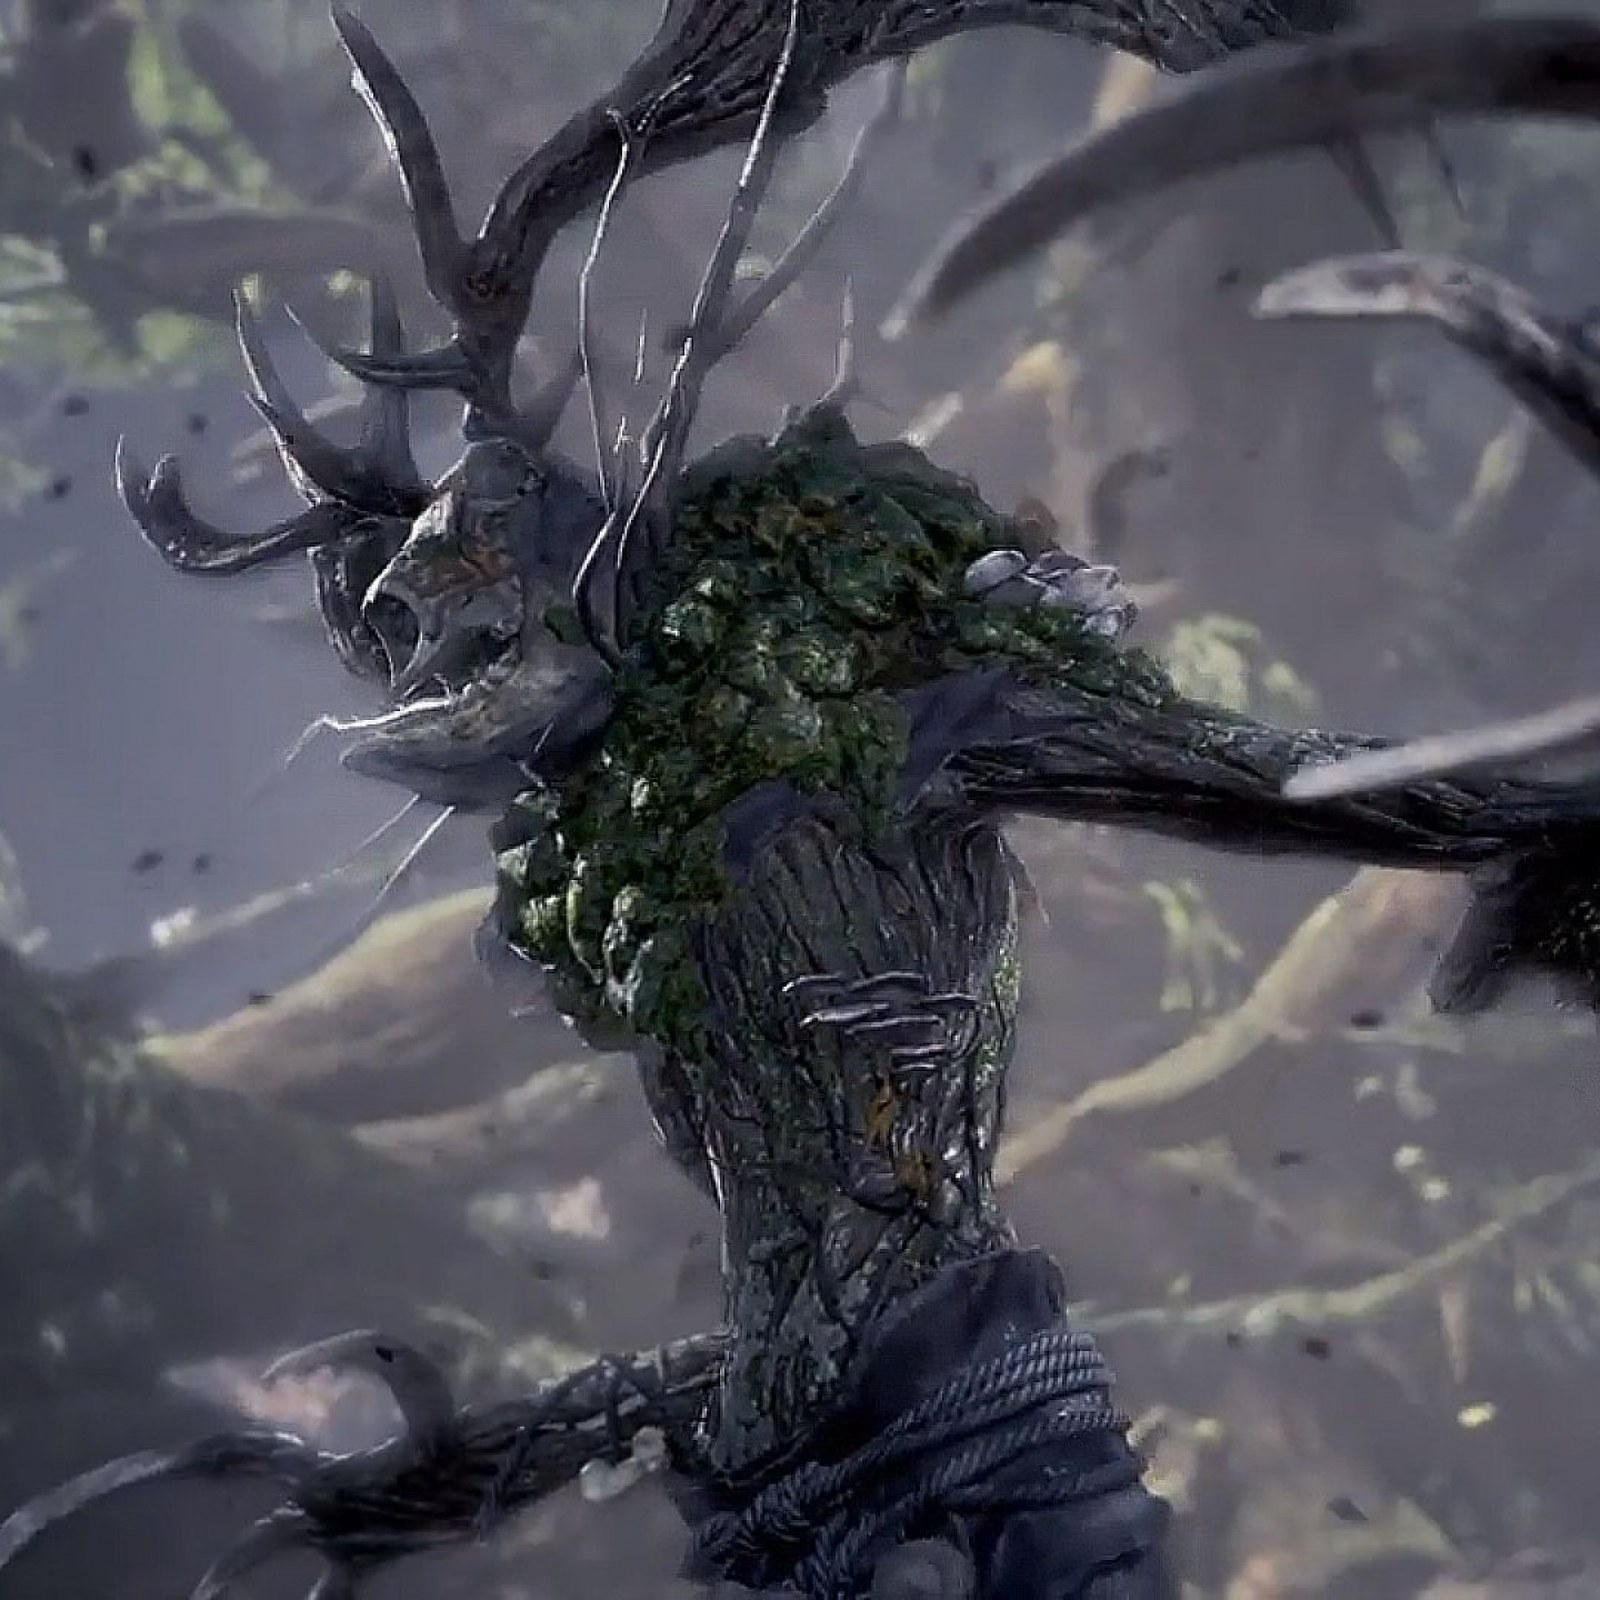 Monster Hunter World 6 01 Update Makes Ancient Leshen Quest